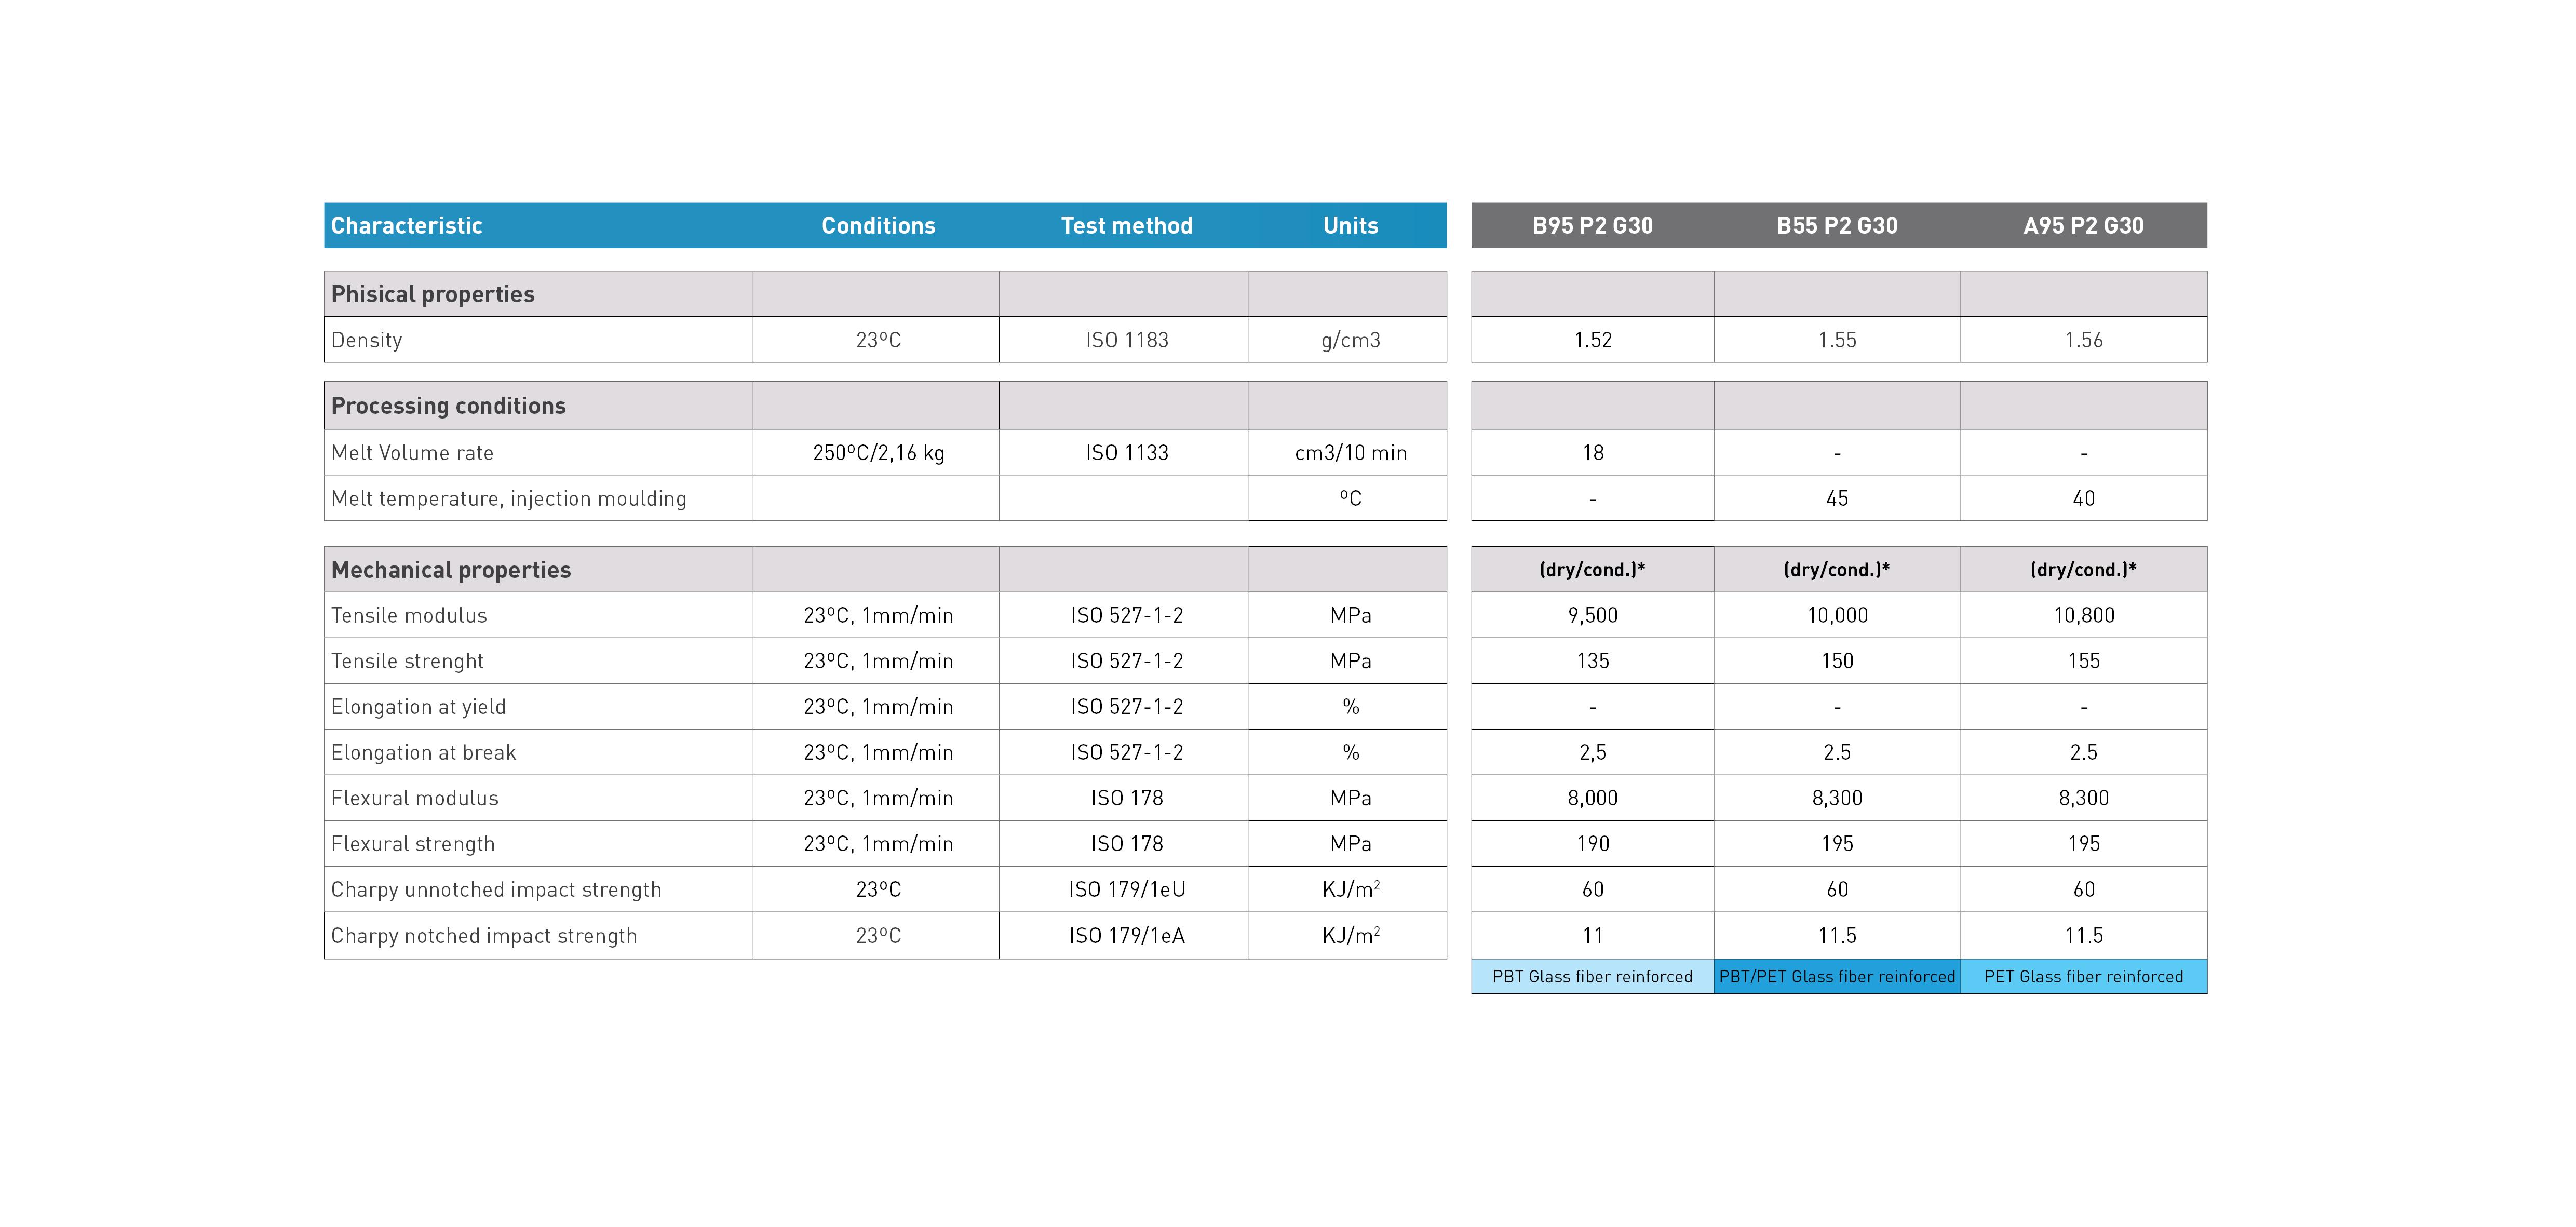 Terylene Grades comparative